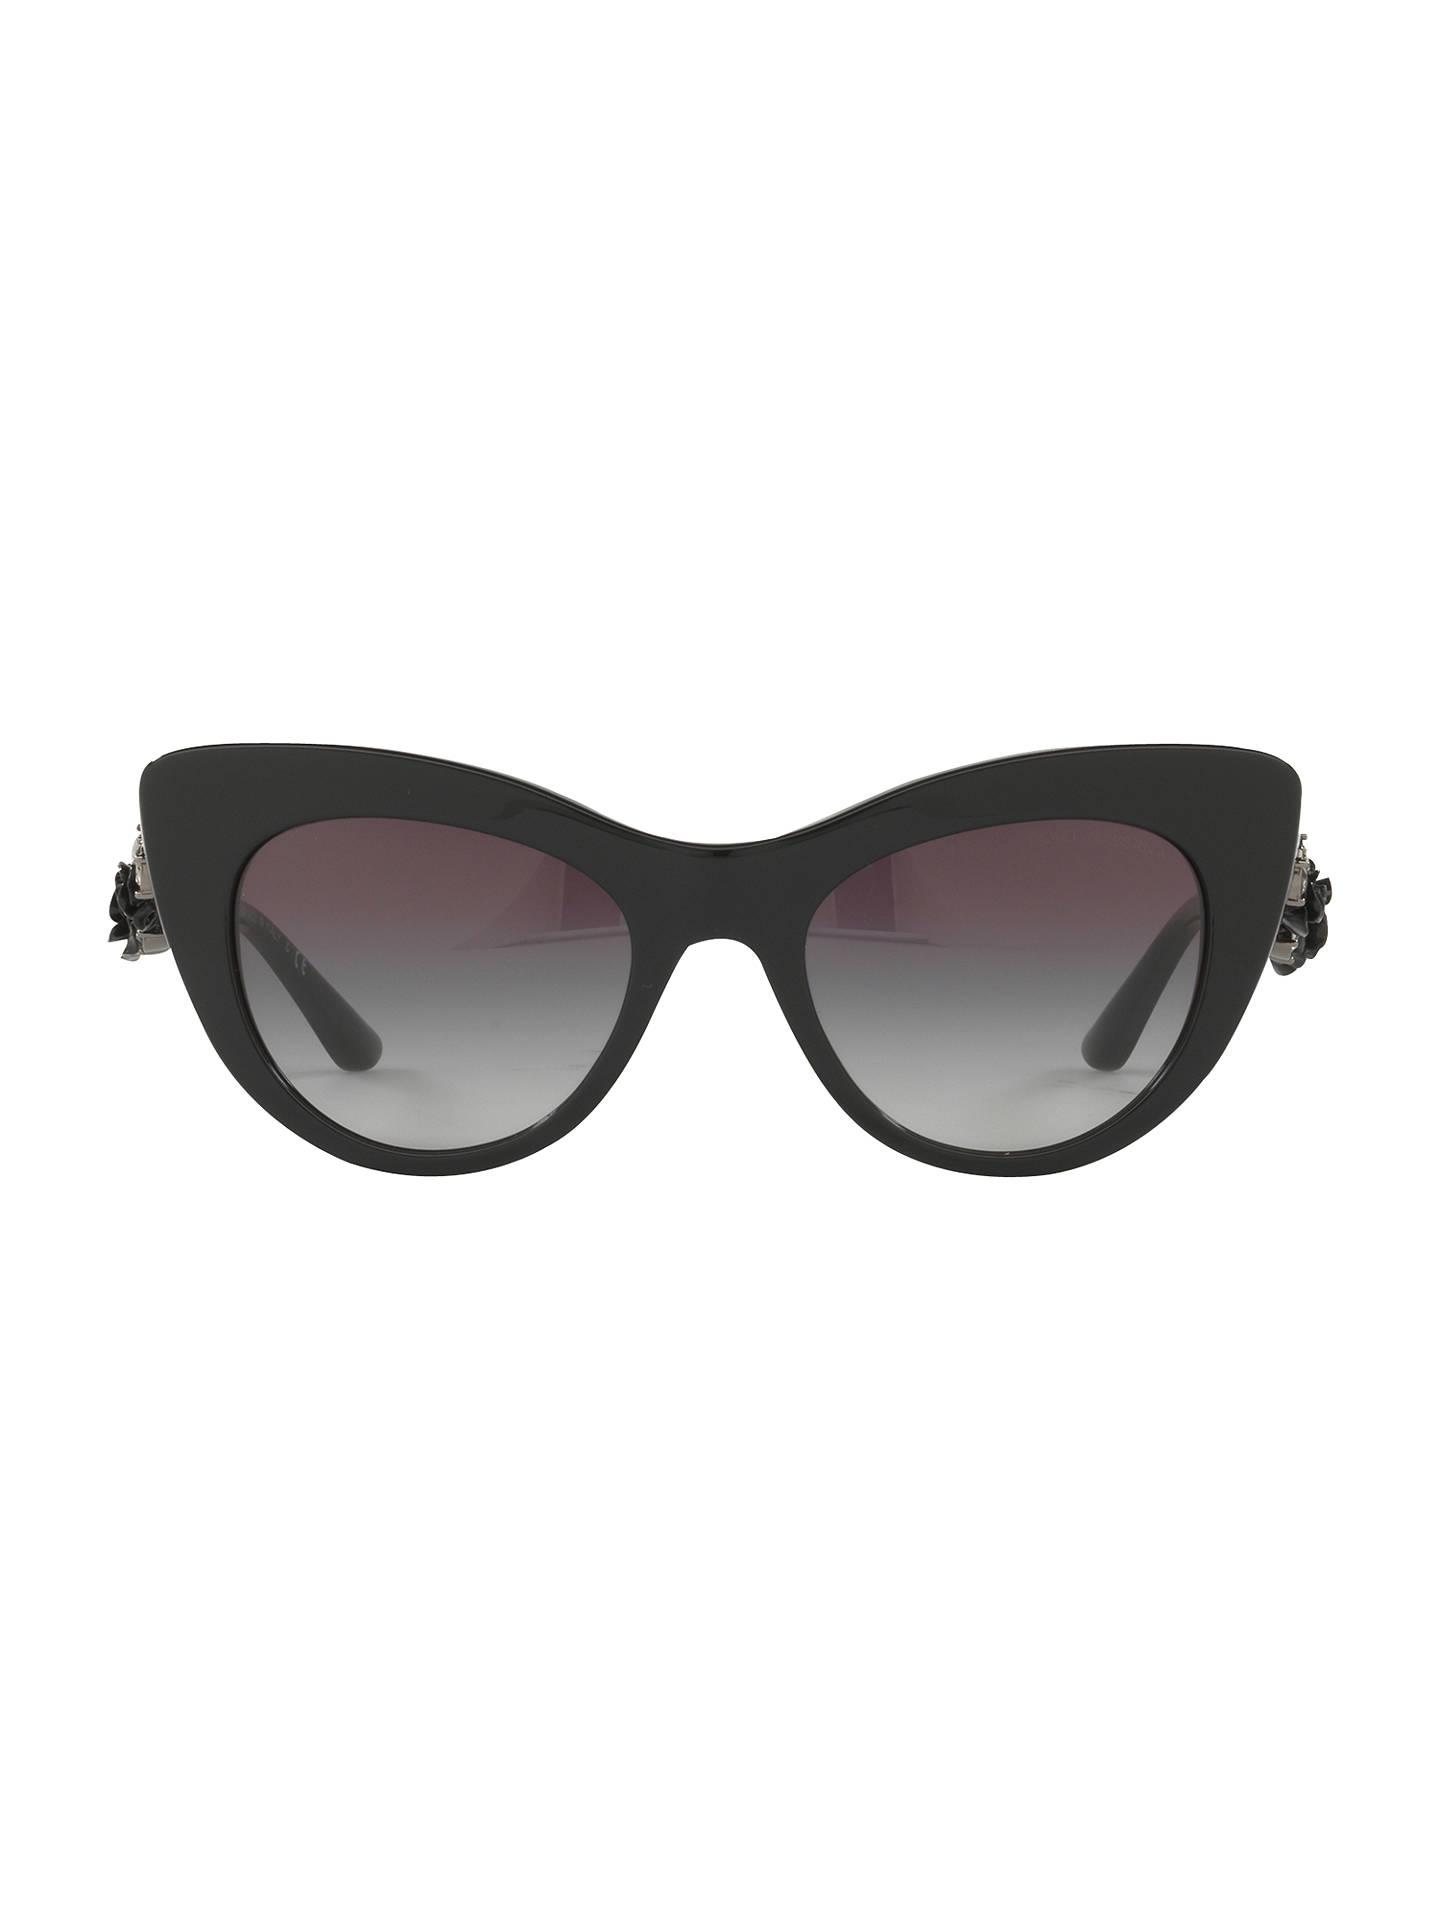 c6c07ff44238 ... Buy Dolce & Gabbana DG4302B Flower Detail Cat's Eye Sunglasses, Dark  Brown Online at johnlewis ...